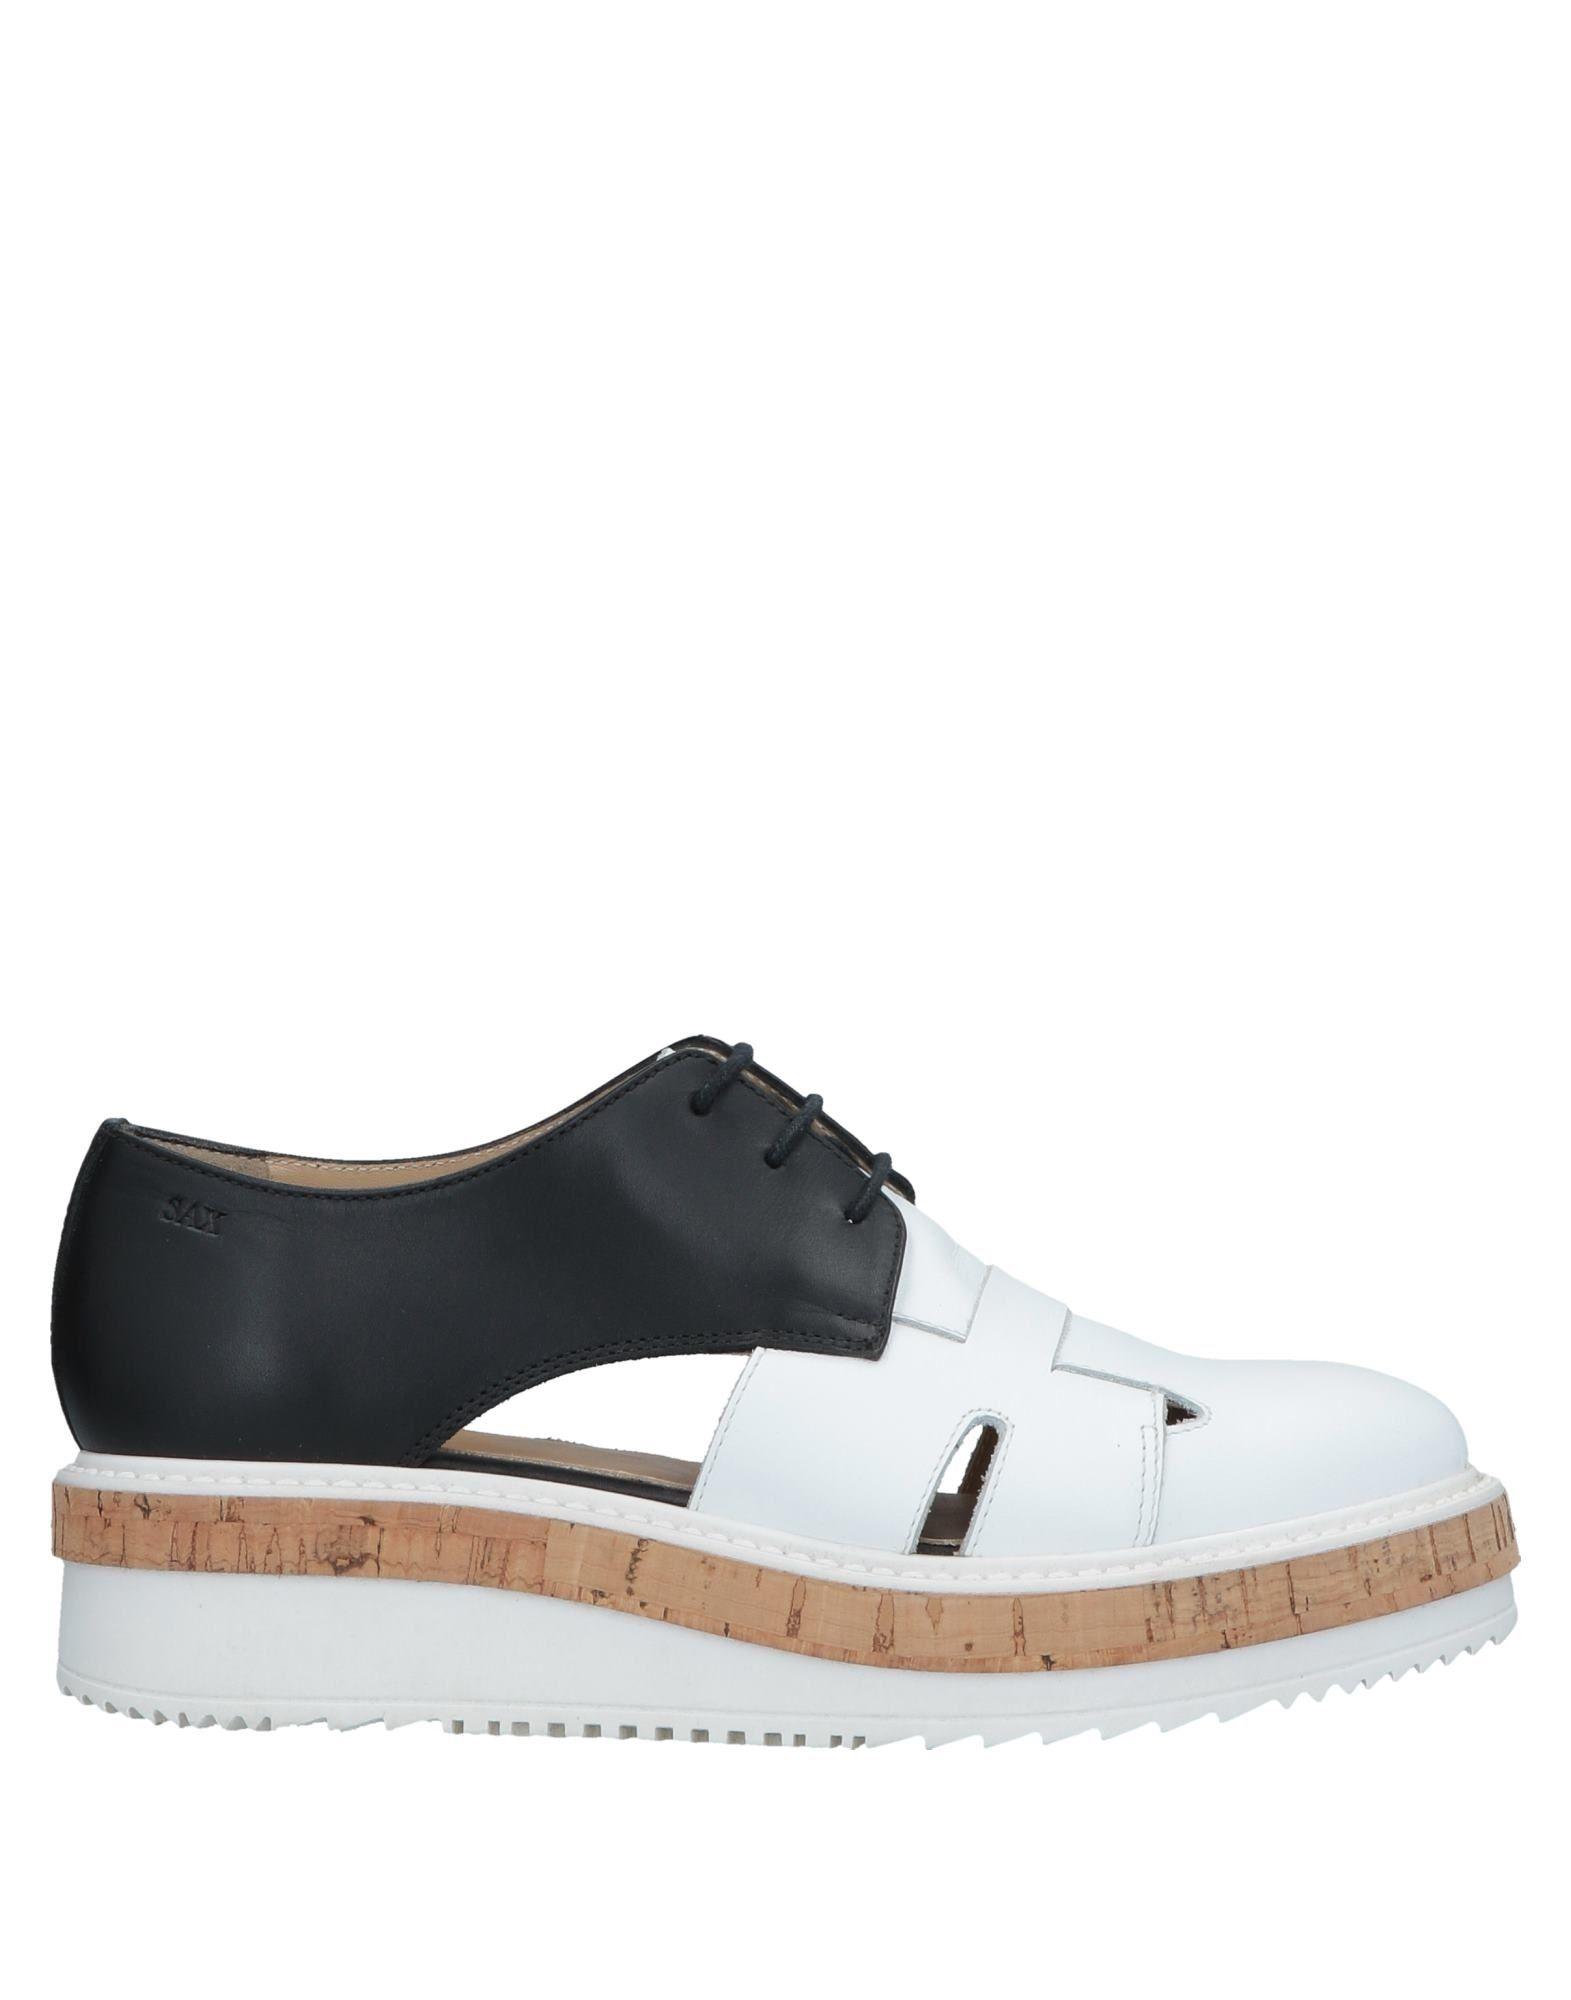 Фото - SAX Обувь на шнурках обувь на высокой платформе dkny